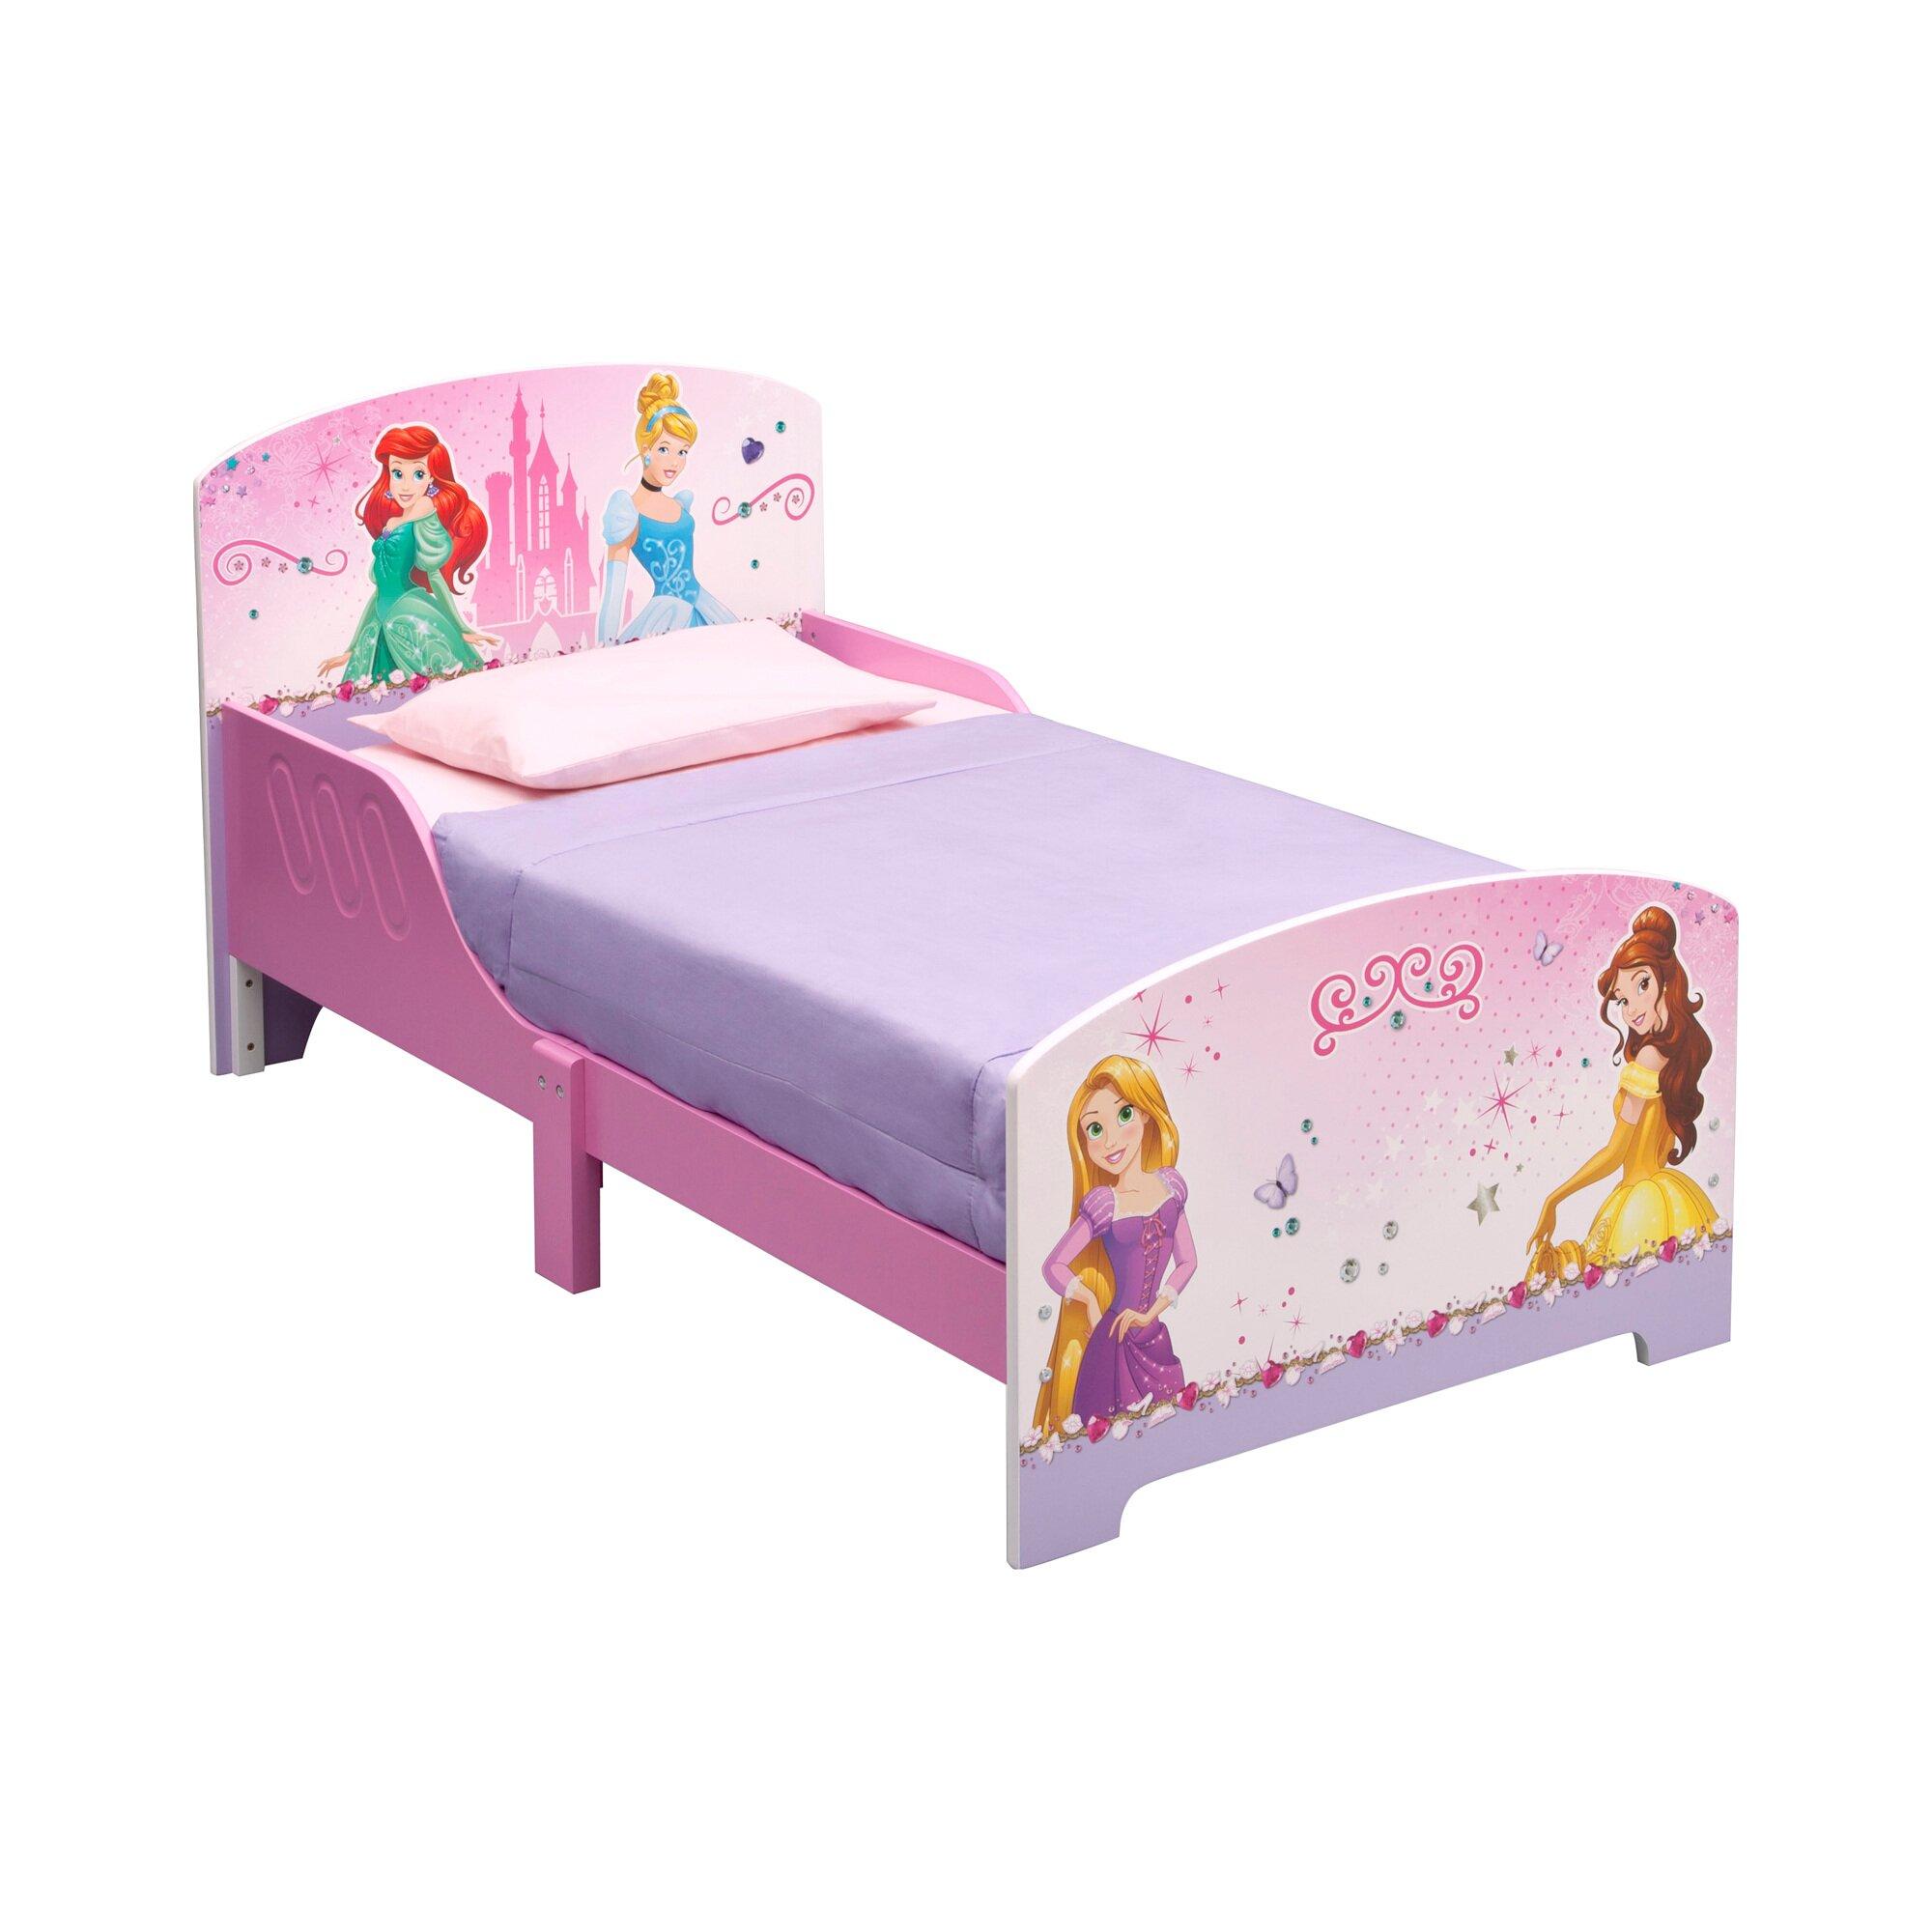 disney-princess-holz-kinderbett-disney-princess-70-x-140-cm